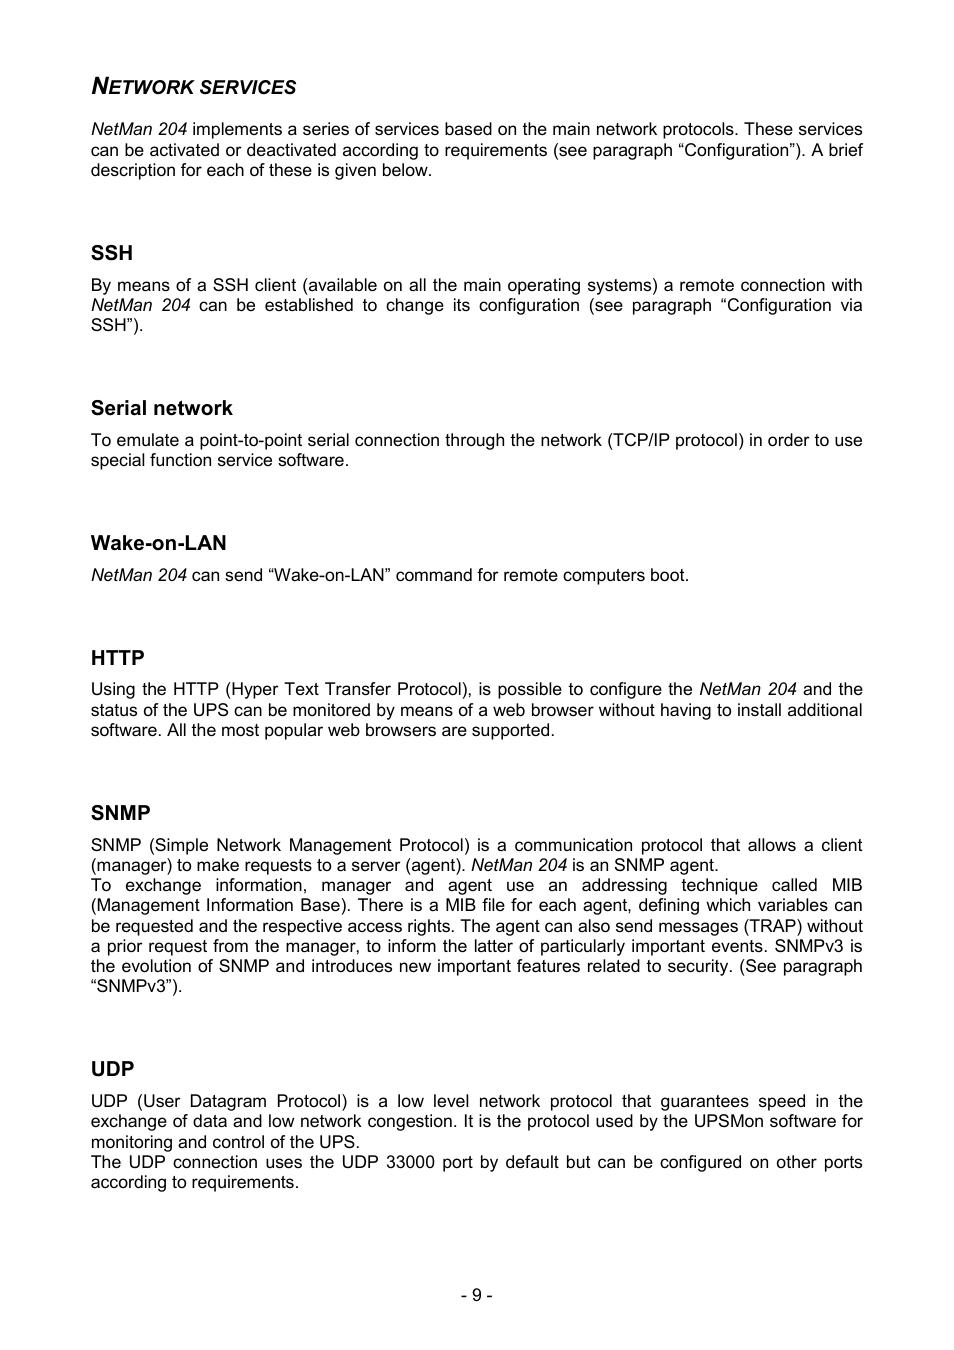 Network services, Serial network, Wake-on-lan | Riello UPS NetMan